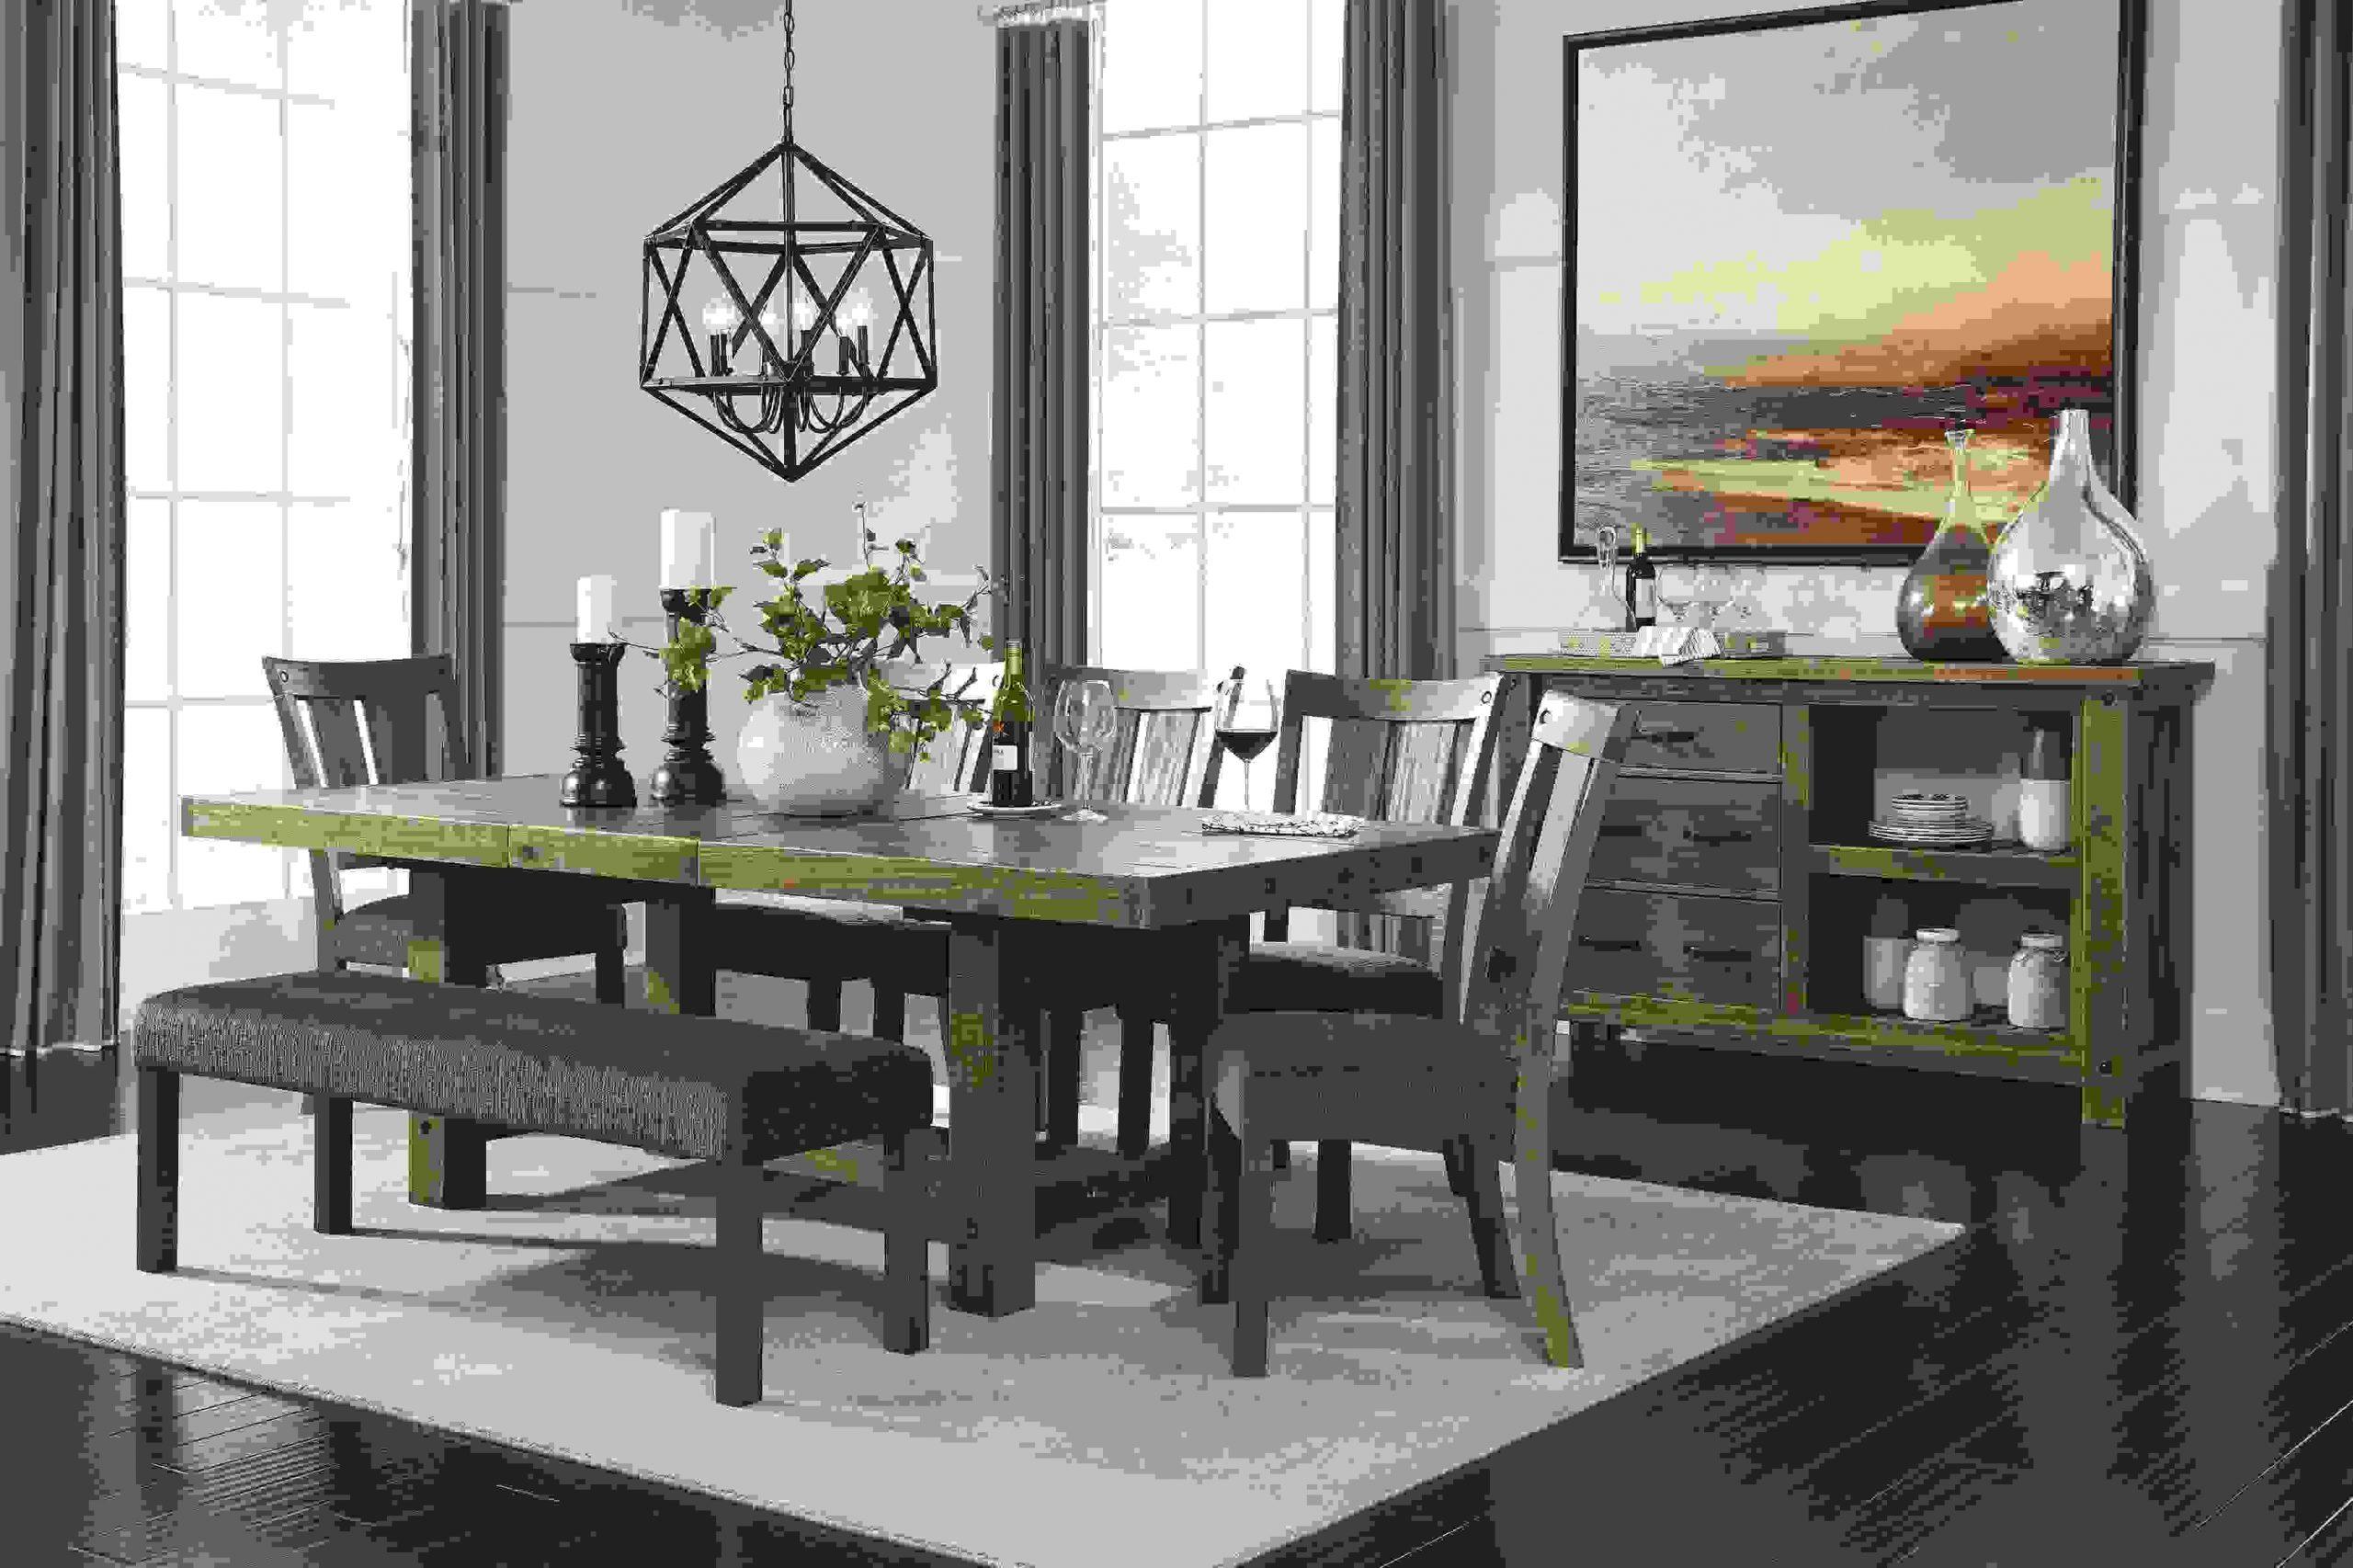 Drtc50 Dining Room Tables Calgary Hausratversicherungkosten